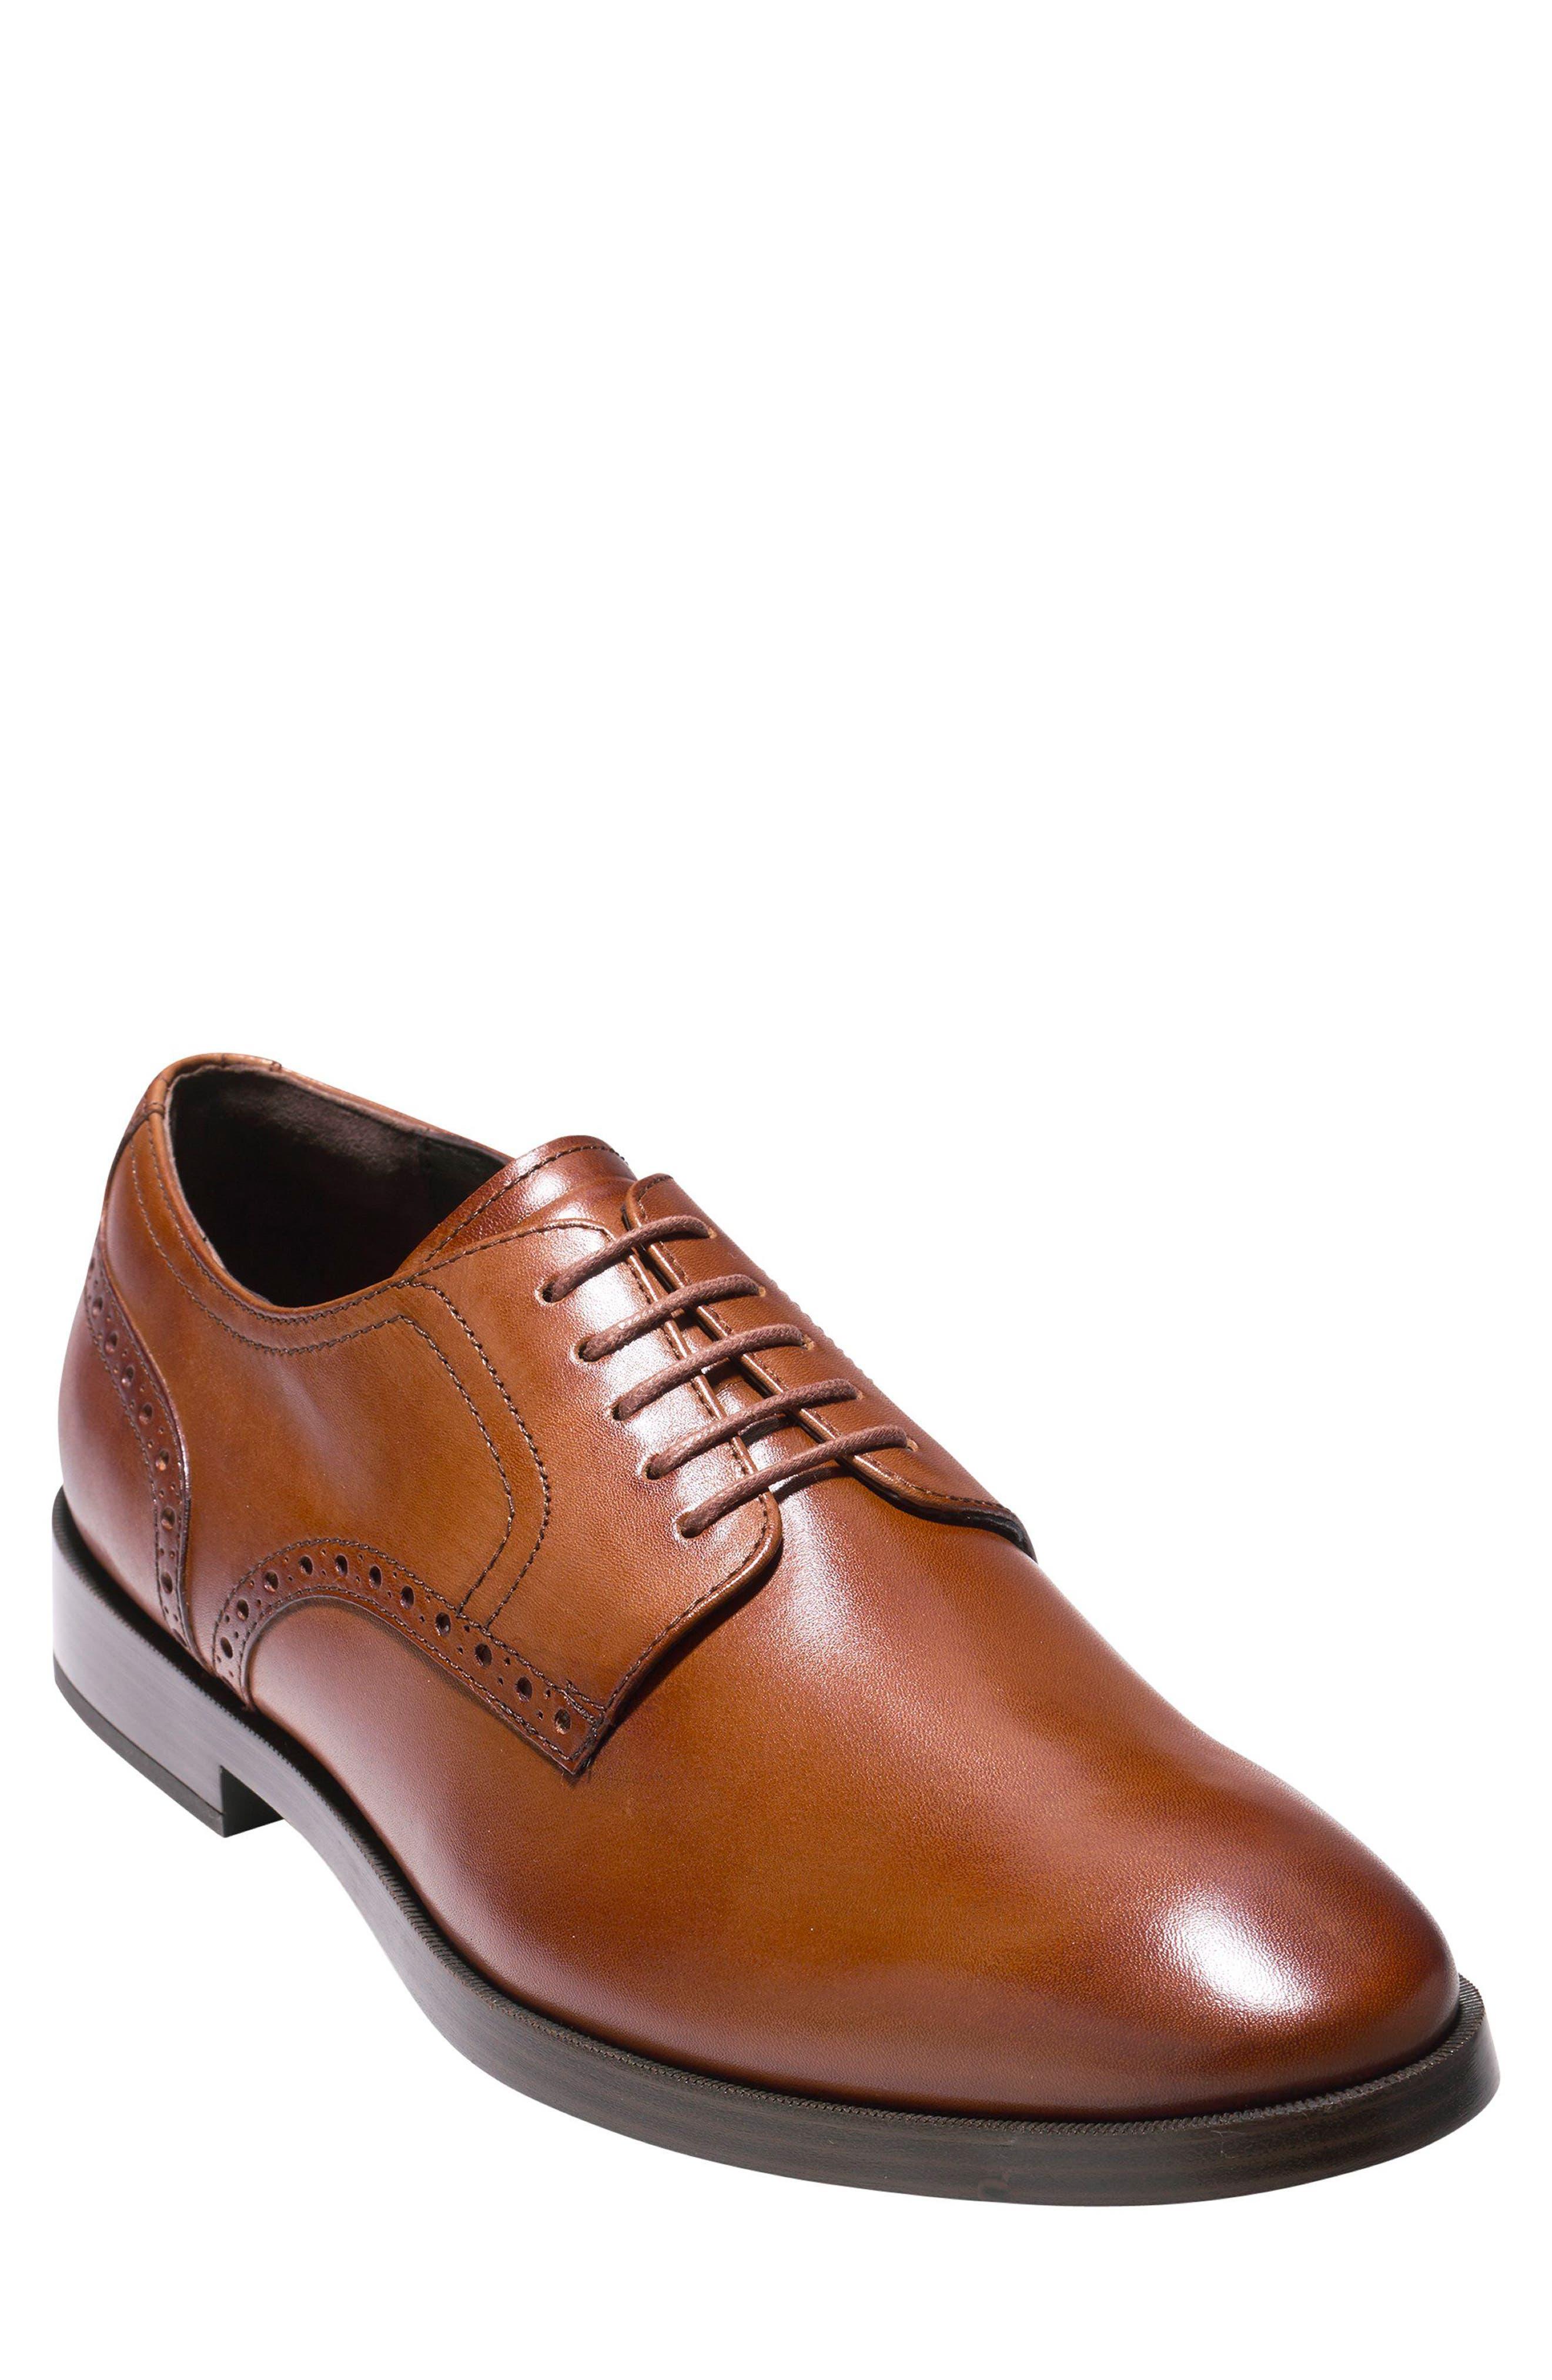 Alternate Image 1 Selected - Cole Haan Jefferson Grand Plain Toe Derby (Men)